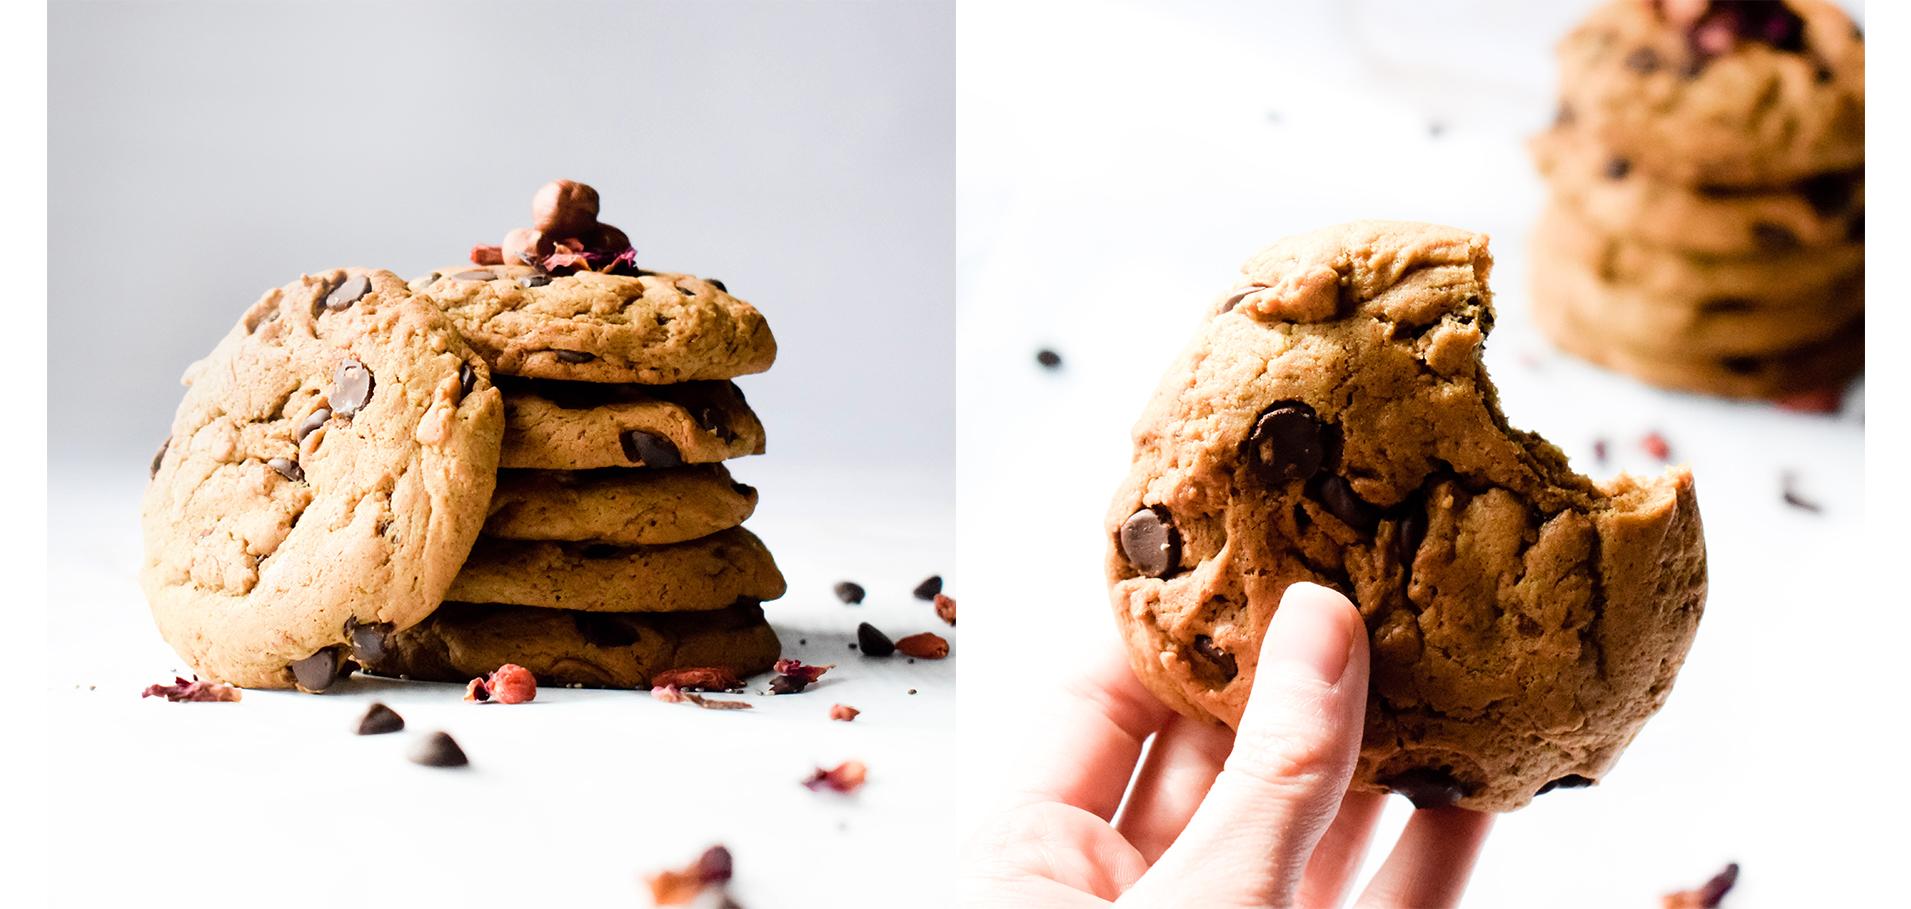 vegan-cookie-choc-chip-recipe-uncaptive-2.jpg